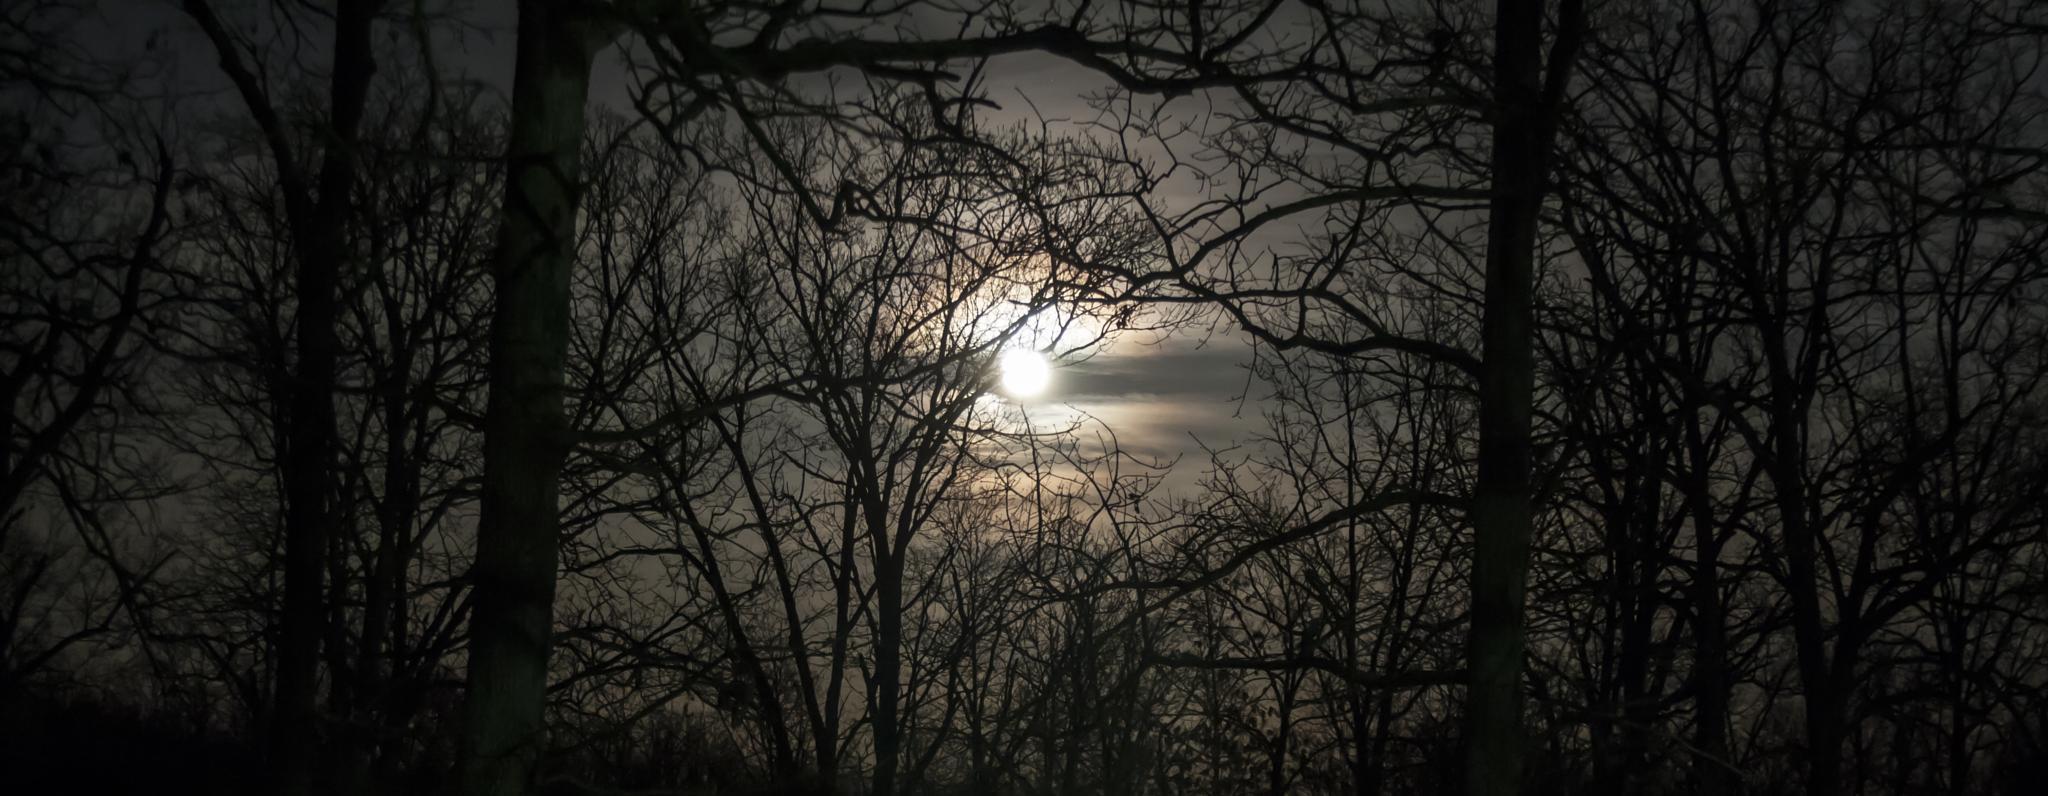 Full Moon by Andrew Hershfeld